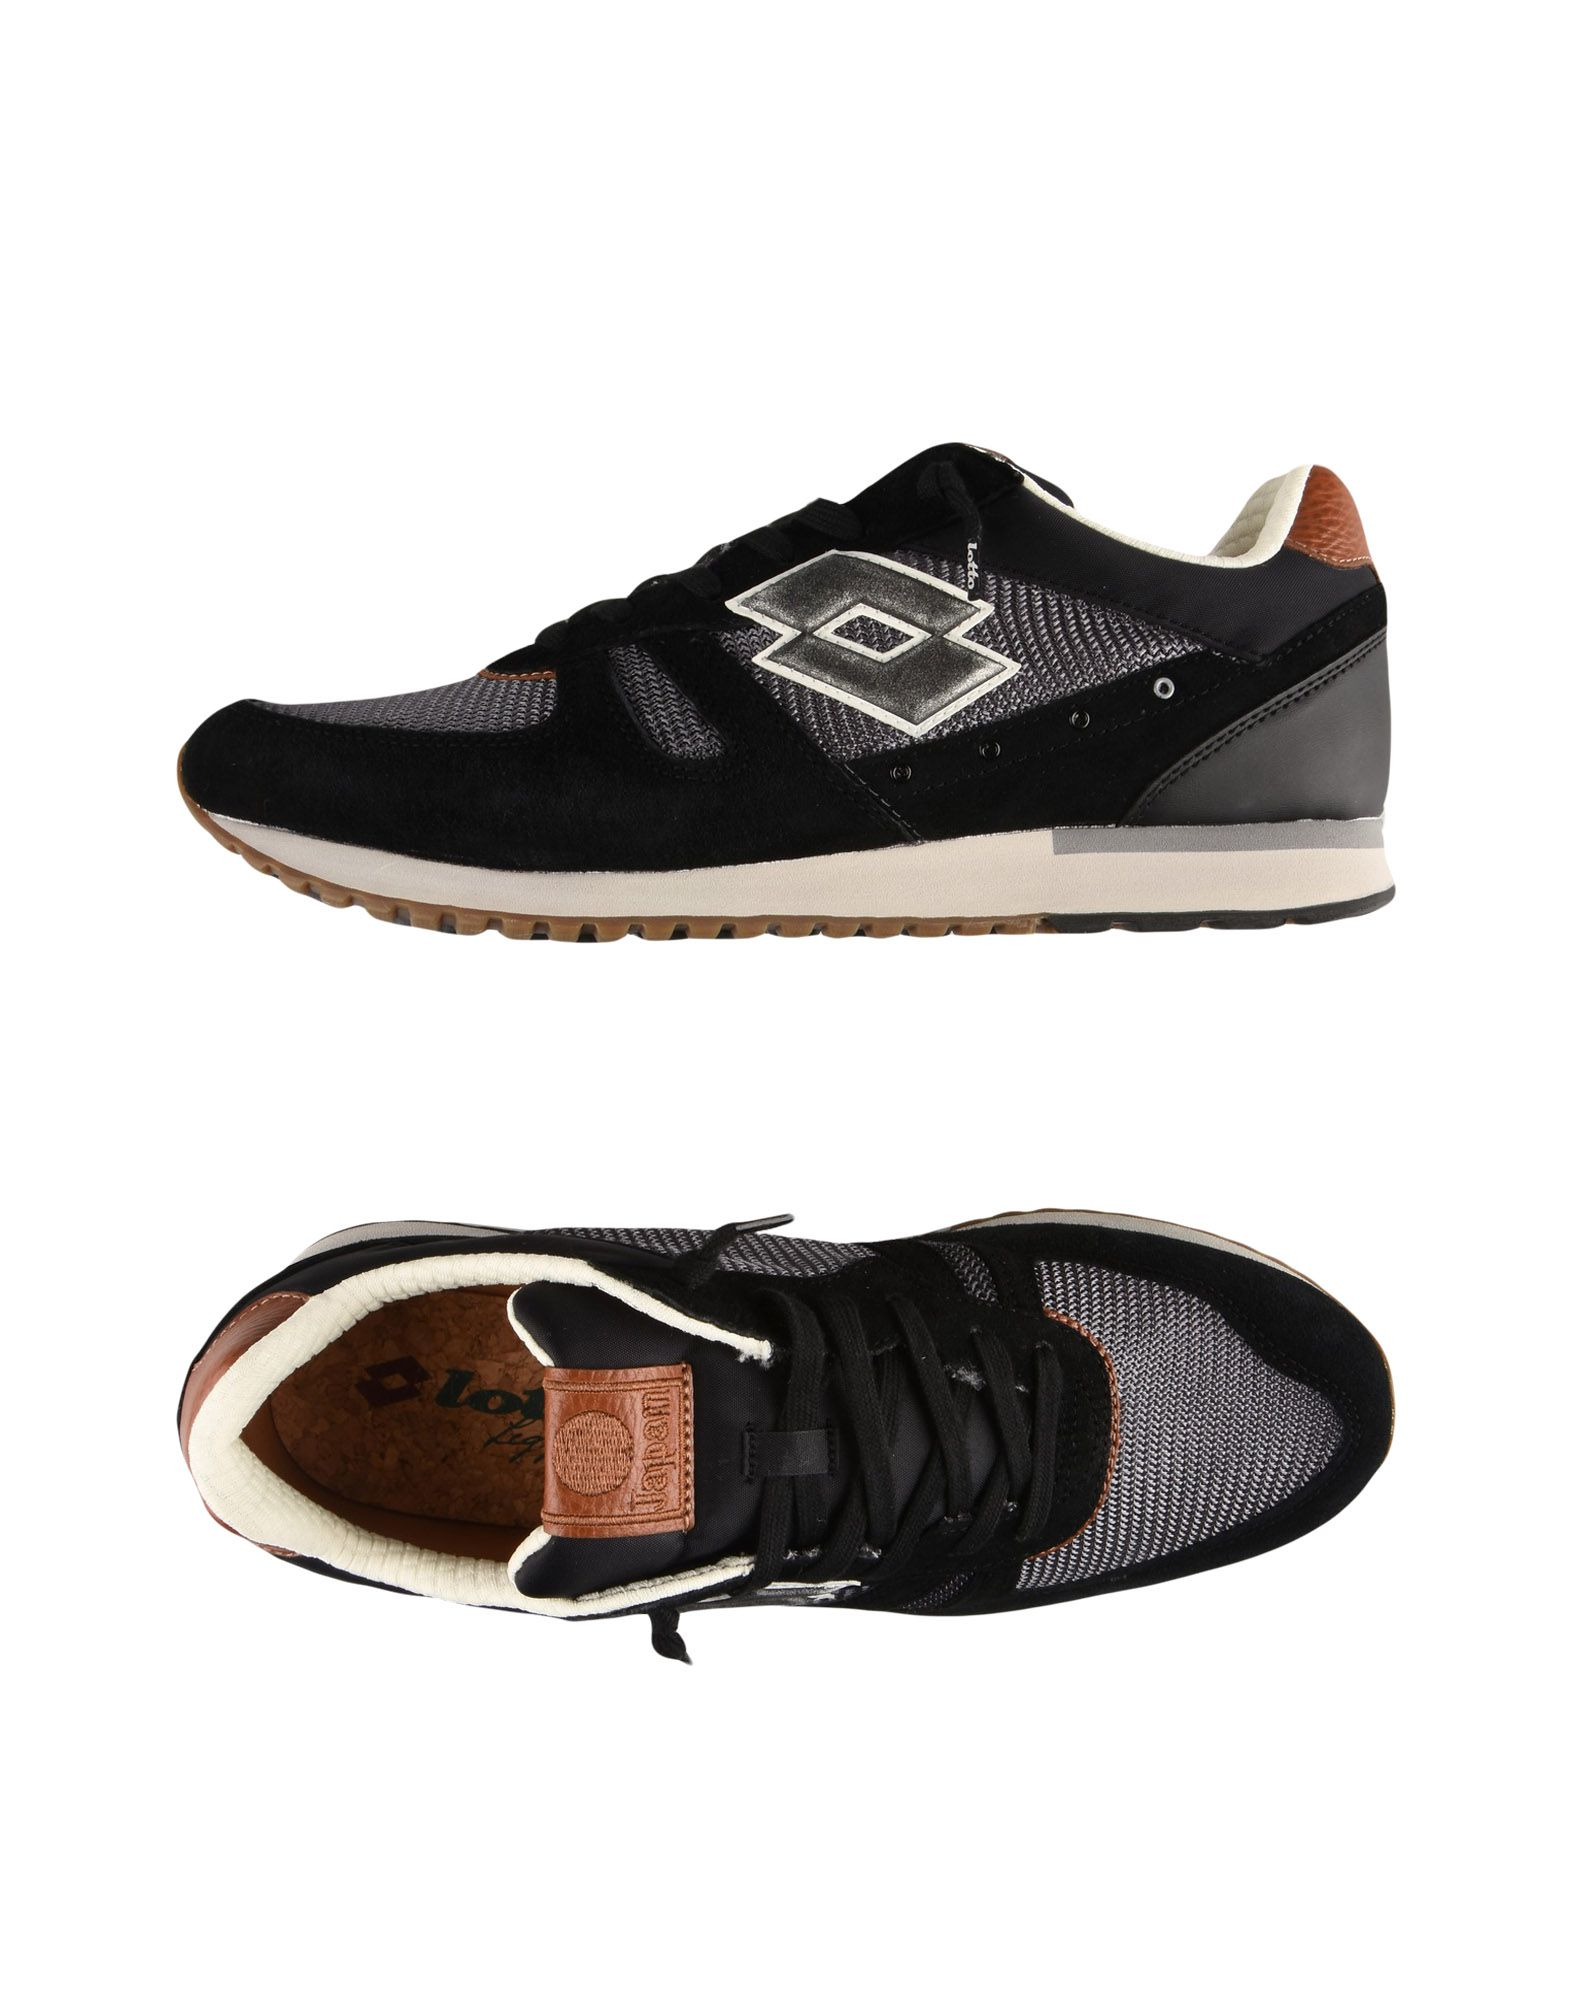 Lotto Leggenda  Tokyo Men Shibuya - Sneakers - Men Tokyo Lotto Leggenda Sneakers online on  Australia - 11237620VL a5b4e4